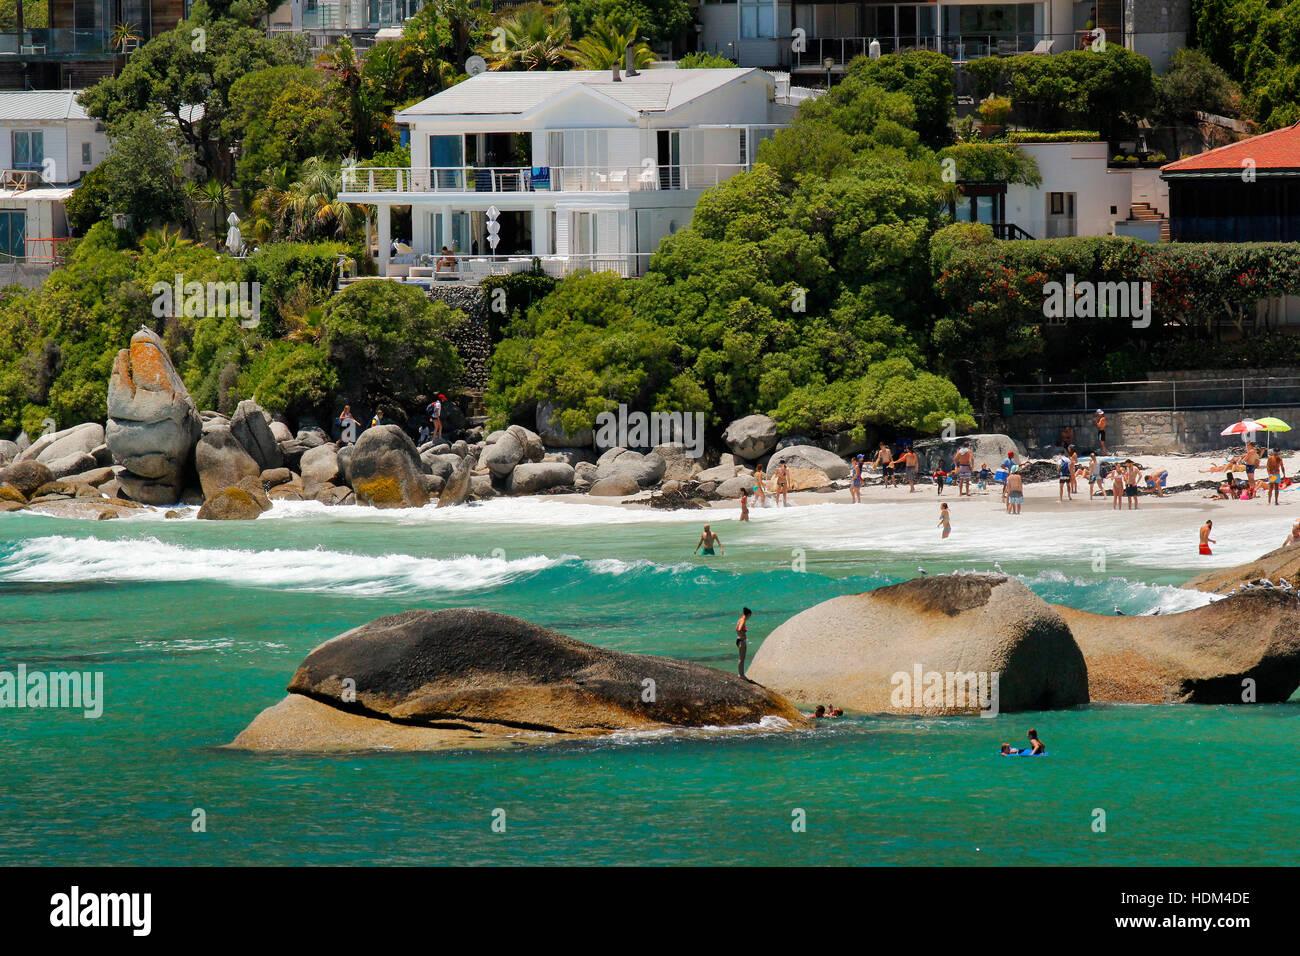 Clifton Beach Stock Photos & Clifton Beach Stock Images - Alamy